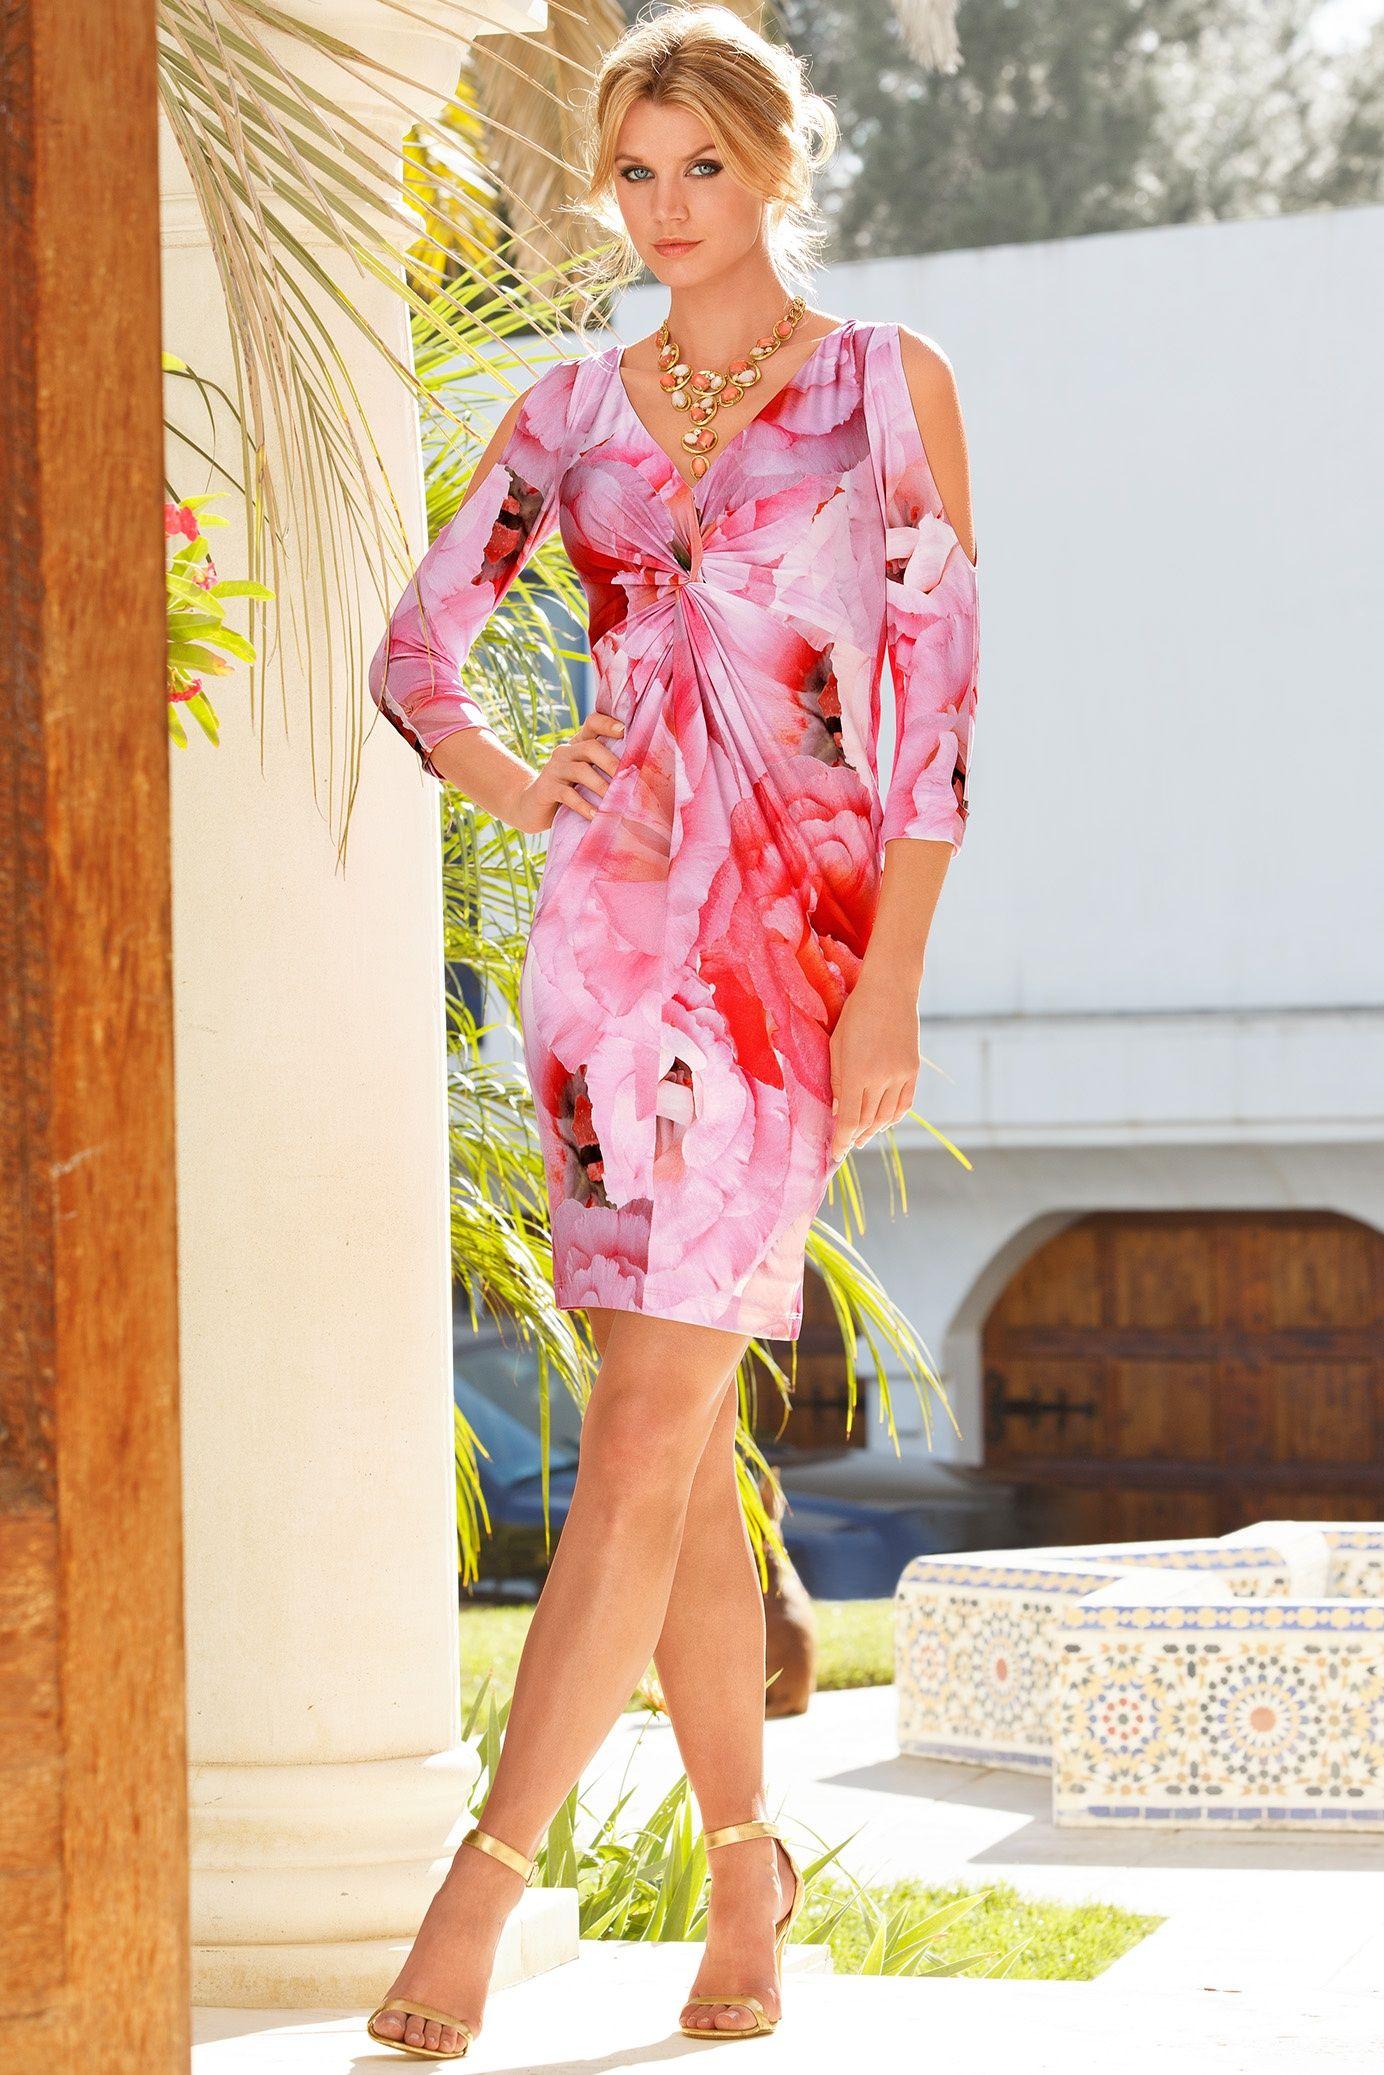 SEEANA | Dress clothes for women, Floral skater dress, Dresses